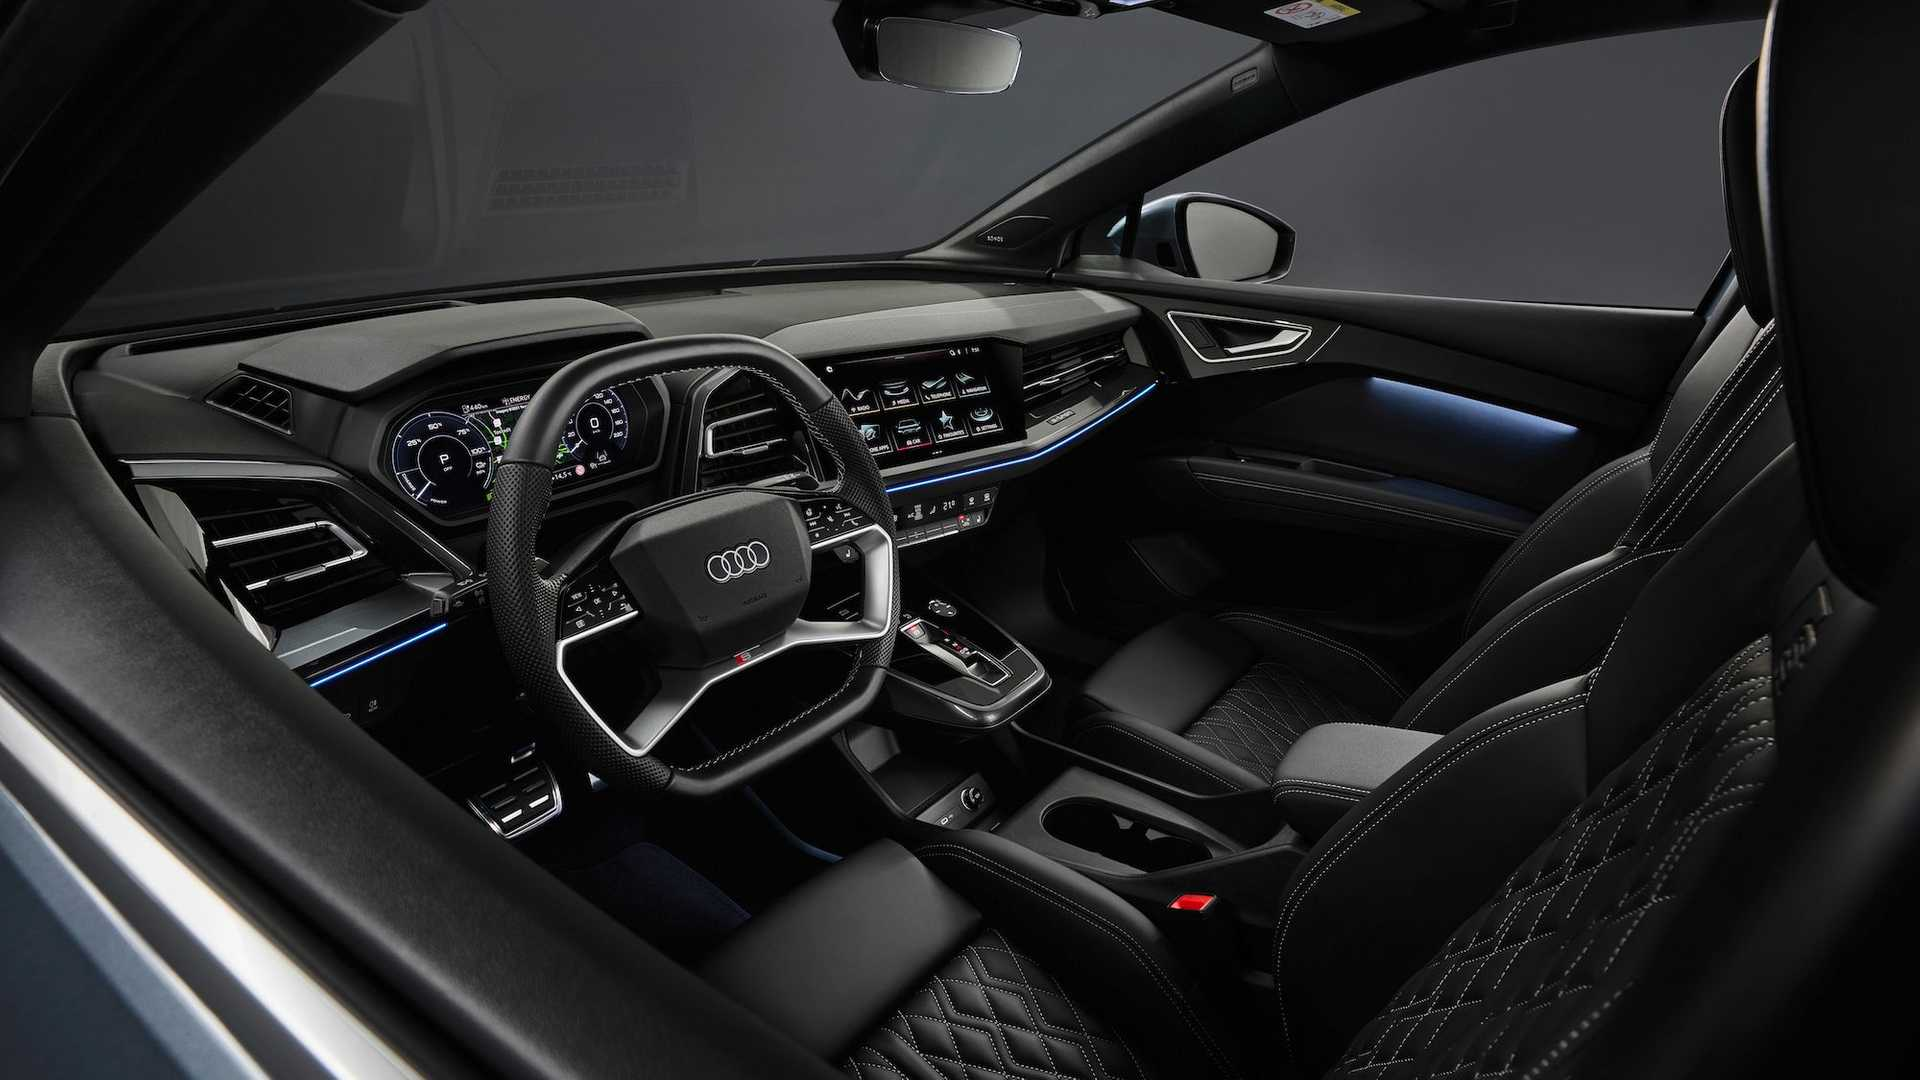 Audi-Q4-e-tron-7.jpg